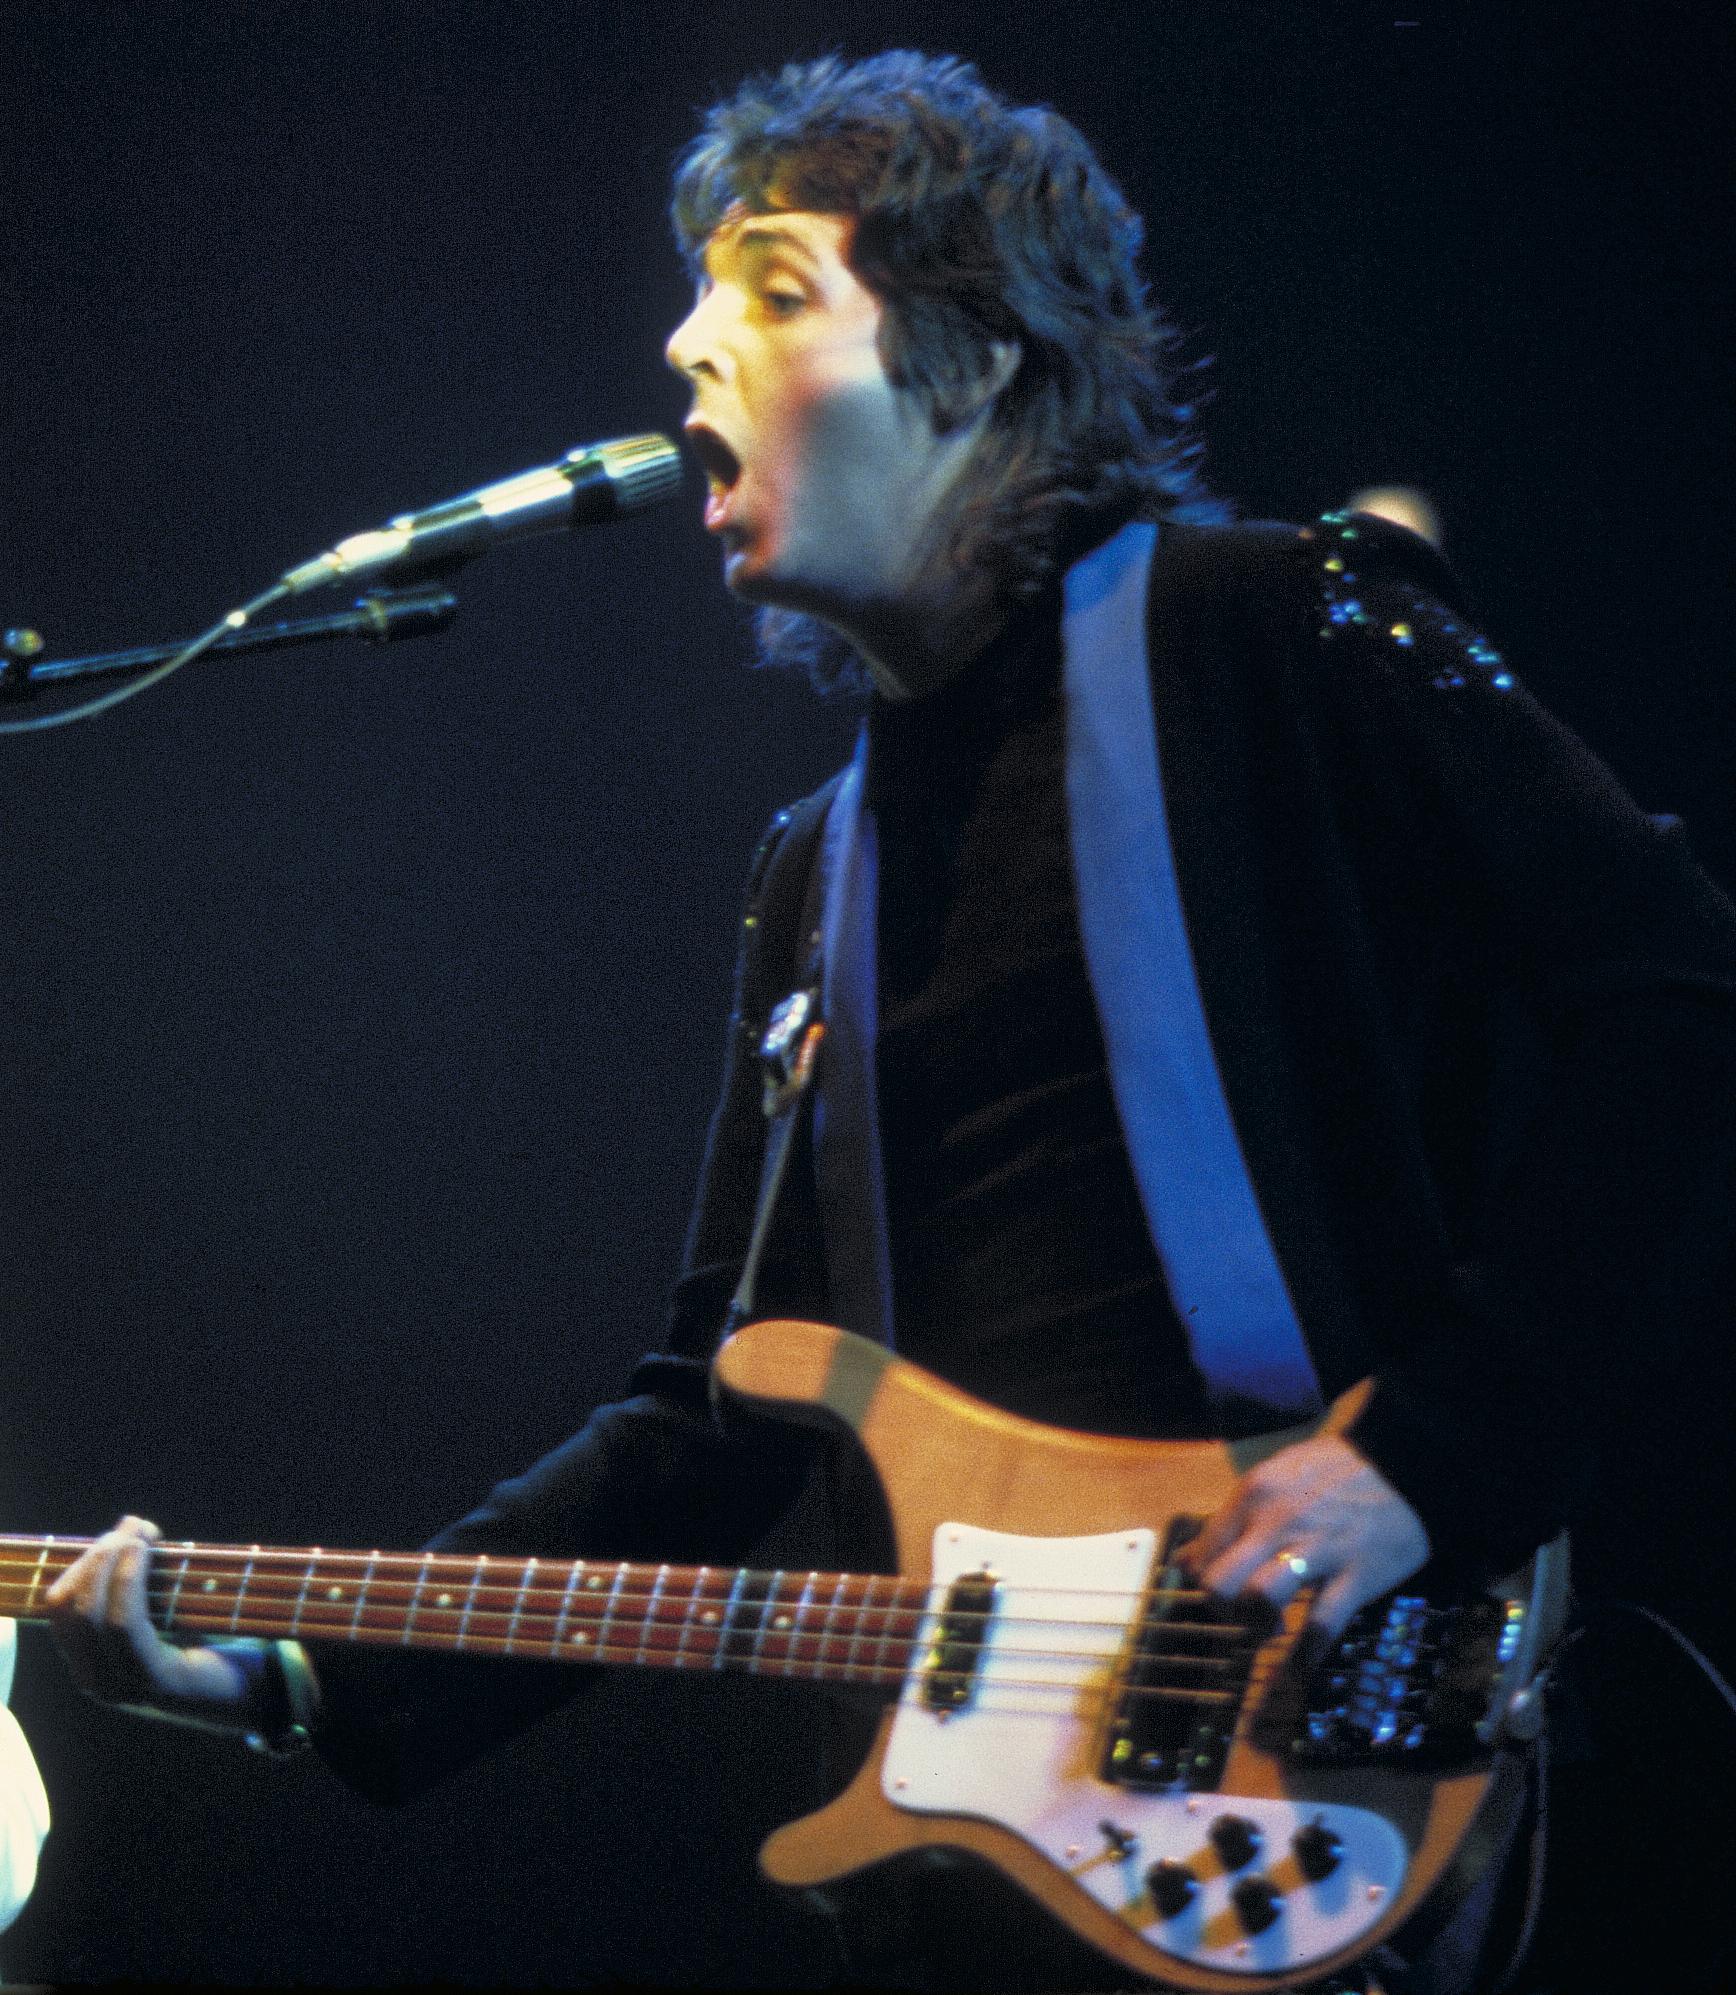 paul mccartney left handed bass player